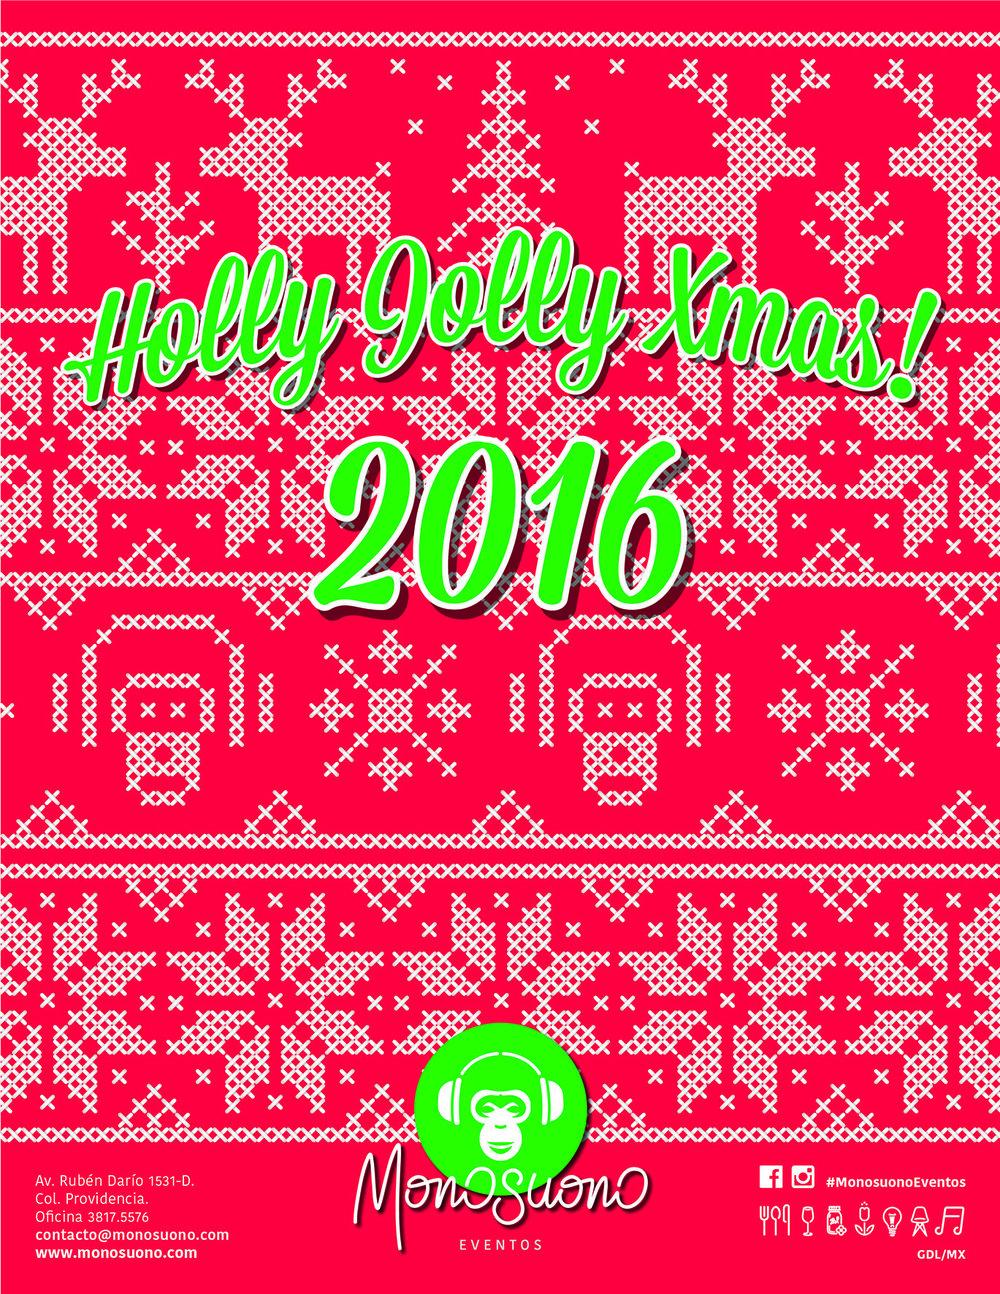 MS_postcard_Xmas_2016_300dpi_CMYK_21.5X28cm.jpg